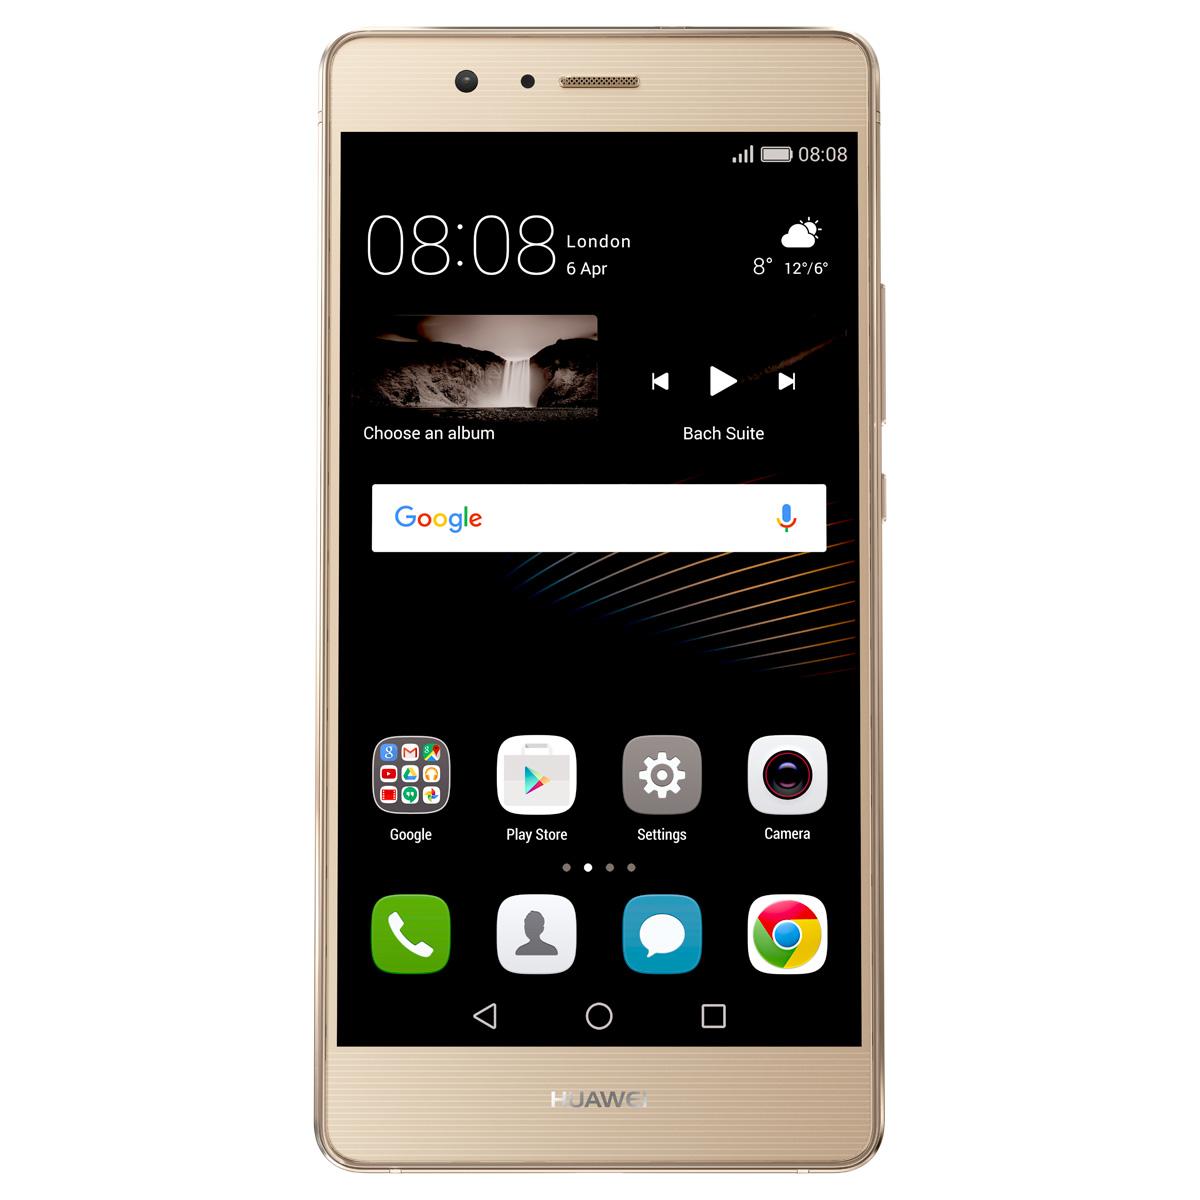 Huawei P9 Lite (4G) - Gold  HU-P9-LITE-G